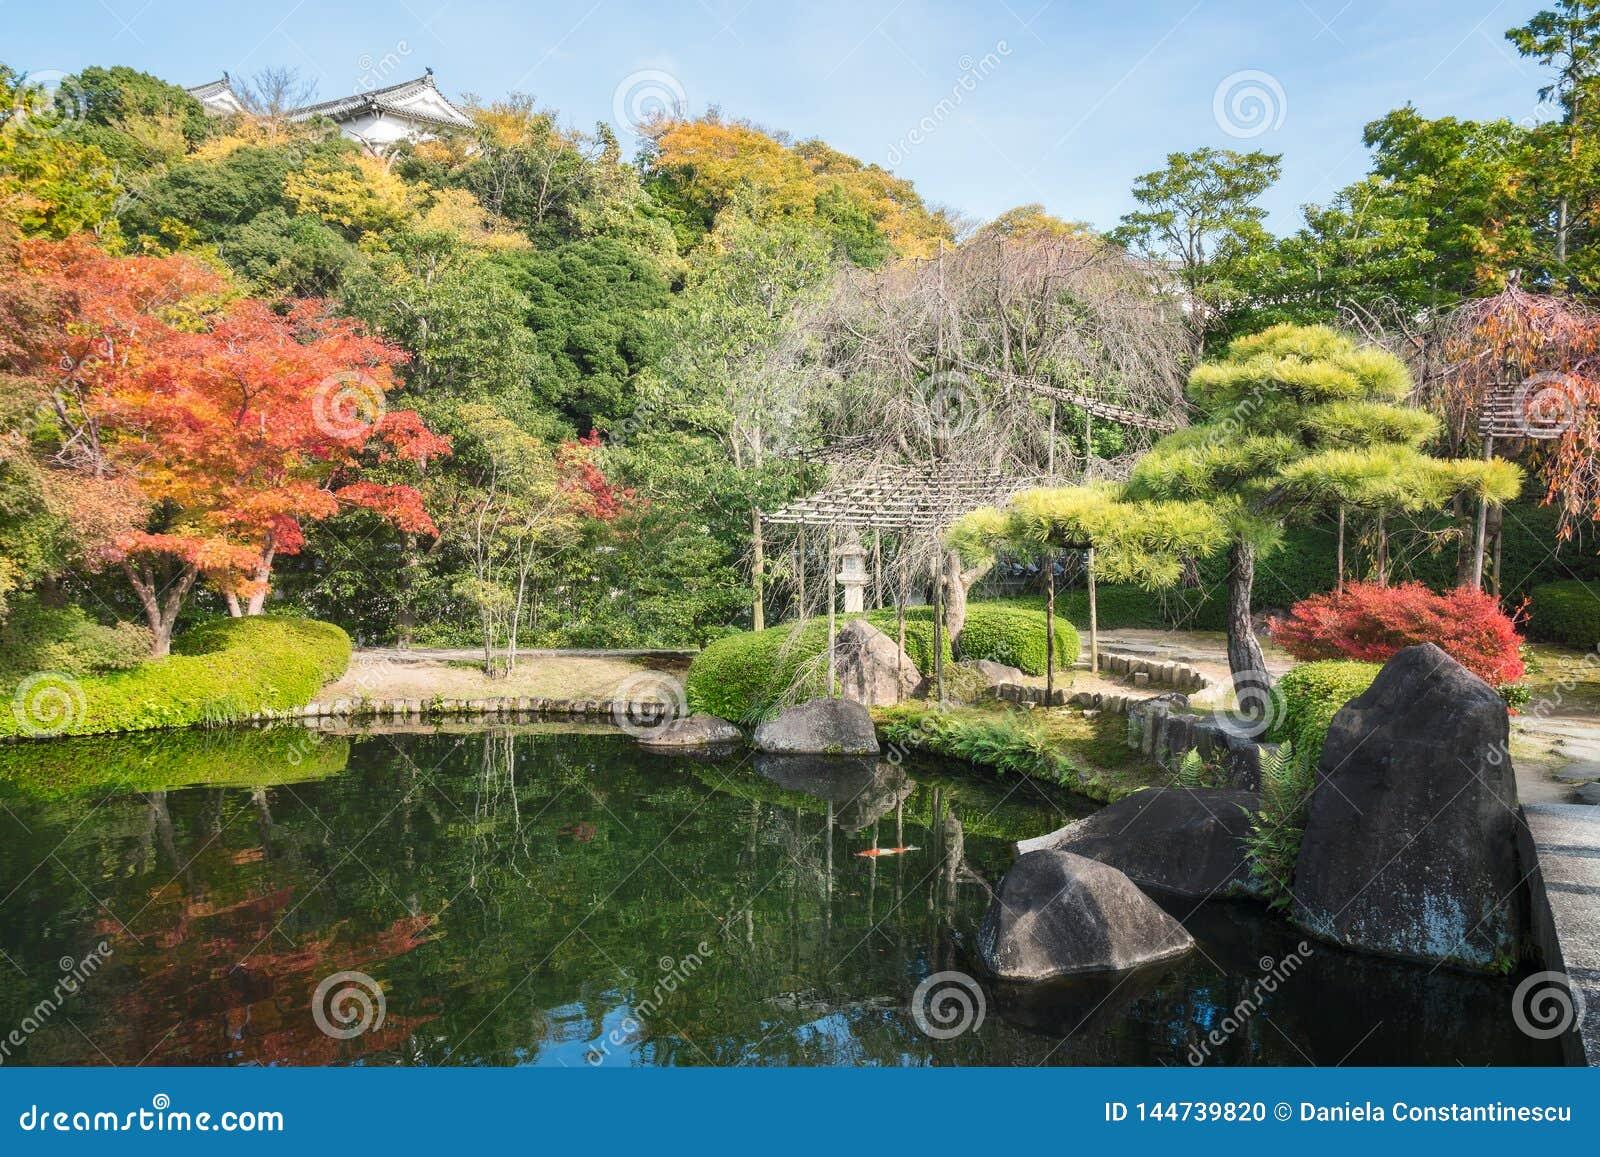 Bezaubernde Ecke des Gartens Koko-en im Herbst, in Himeji, Japan